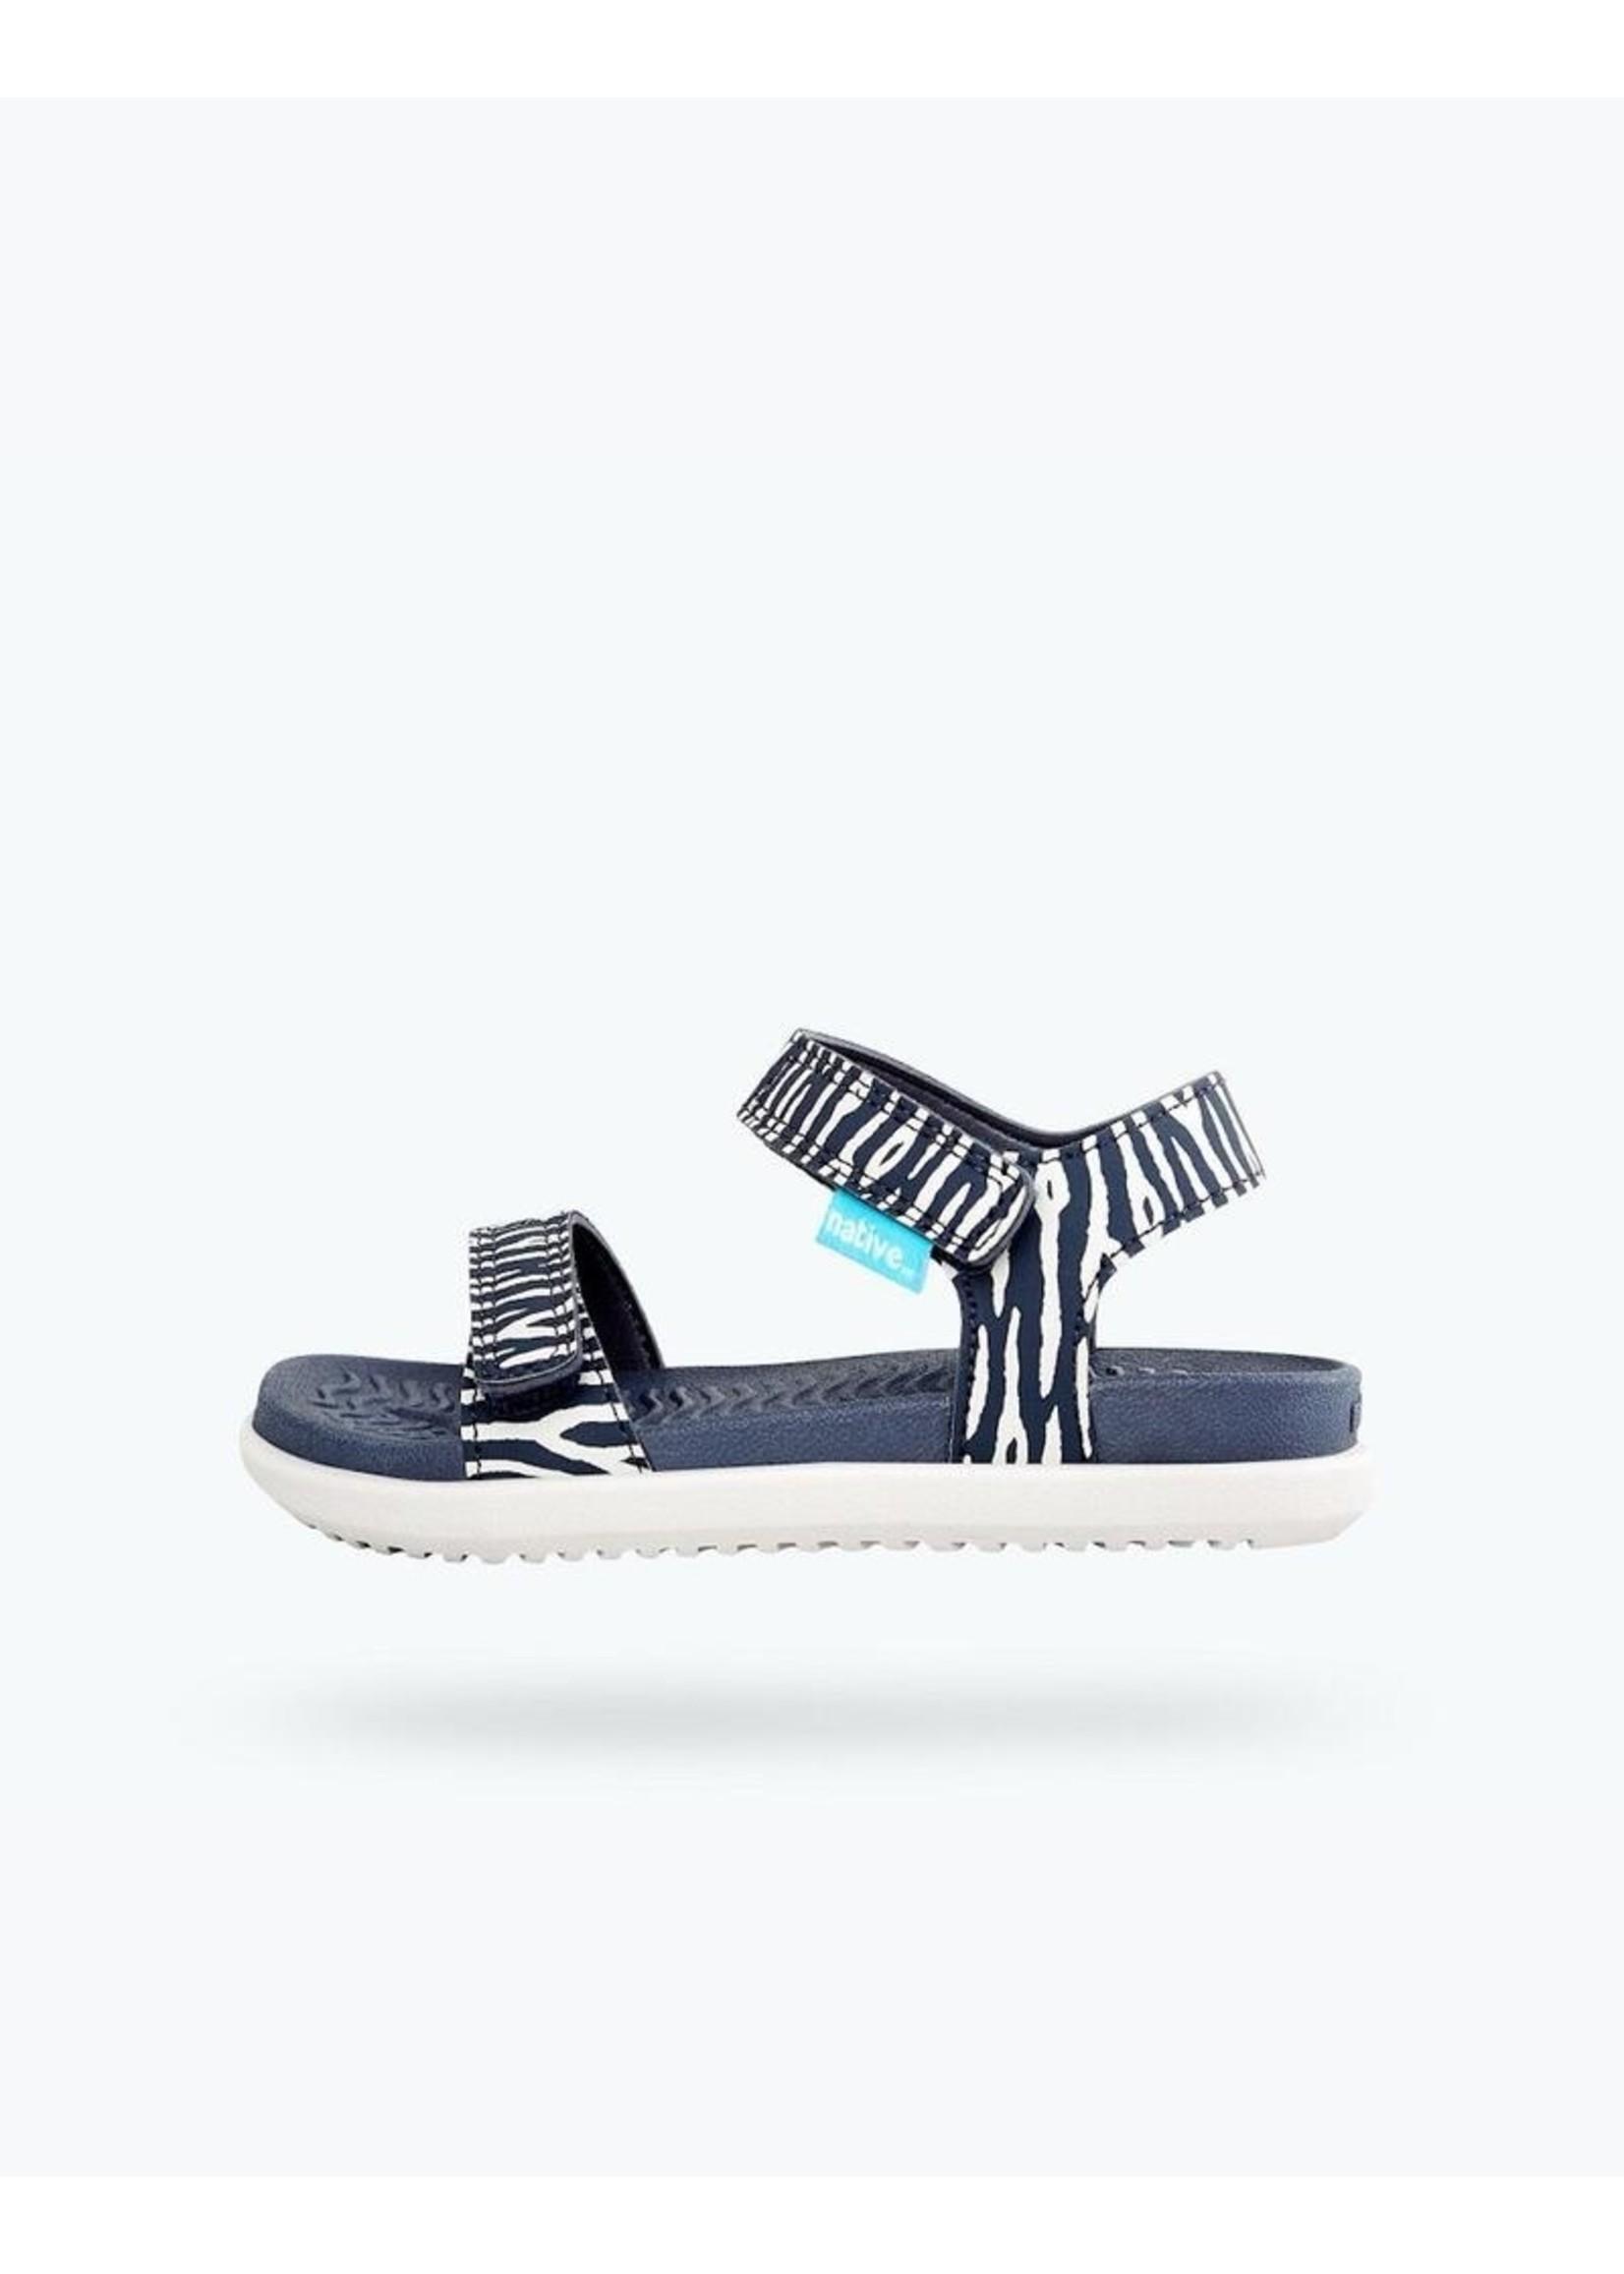 Native Shoes Native Shoes, Charley Print Child in Darknite Grey/ Zinc Grey/ Zebra Cuddlefish